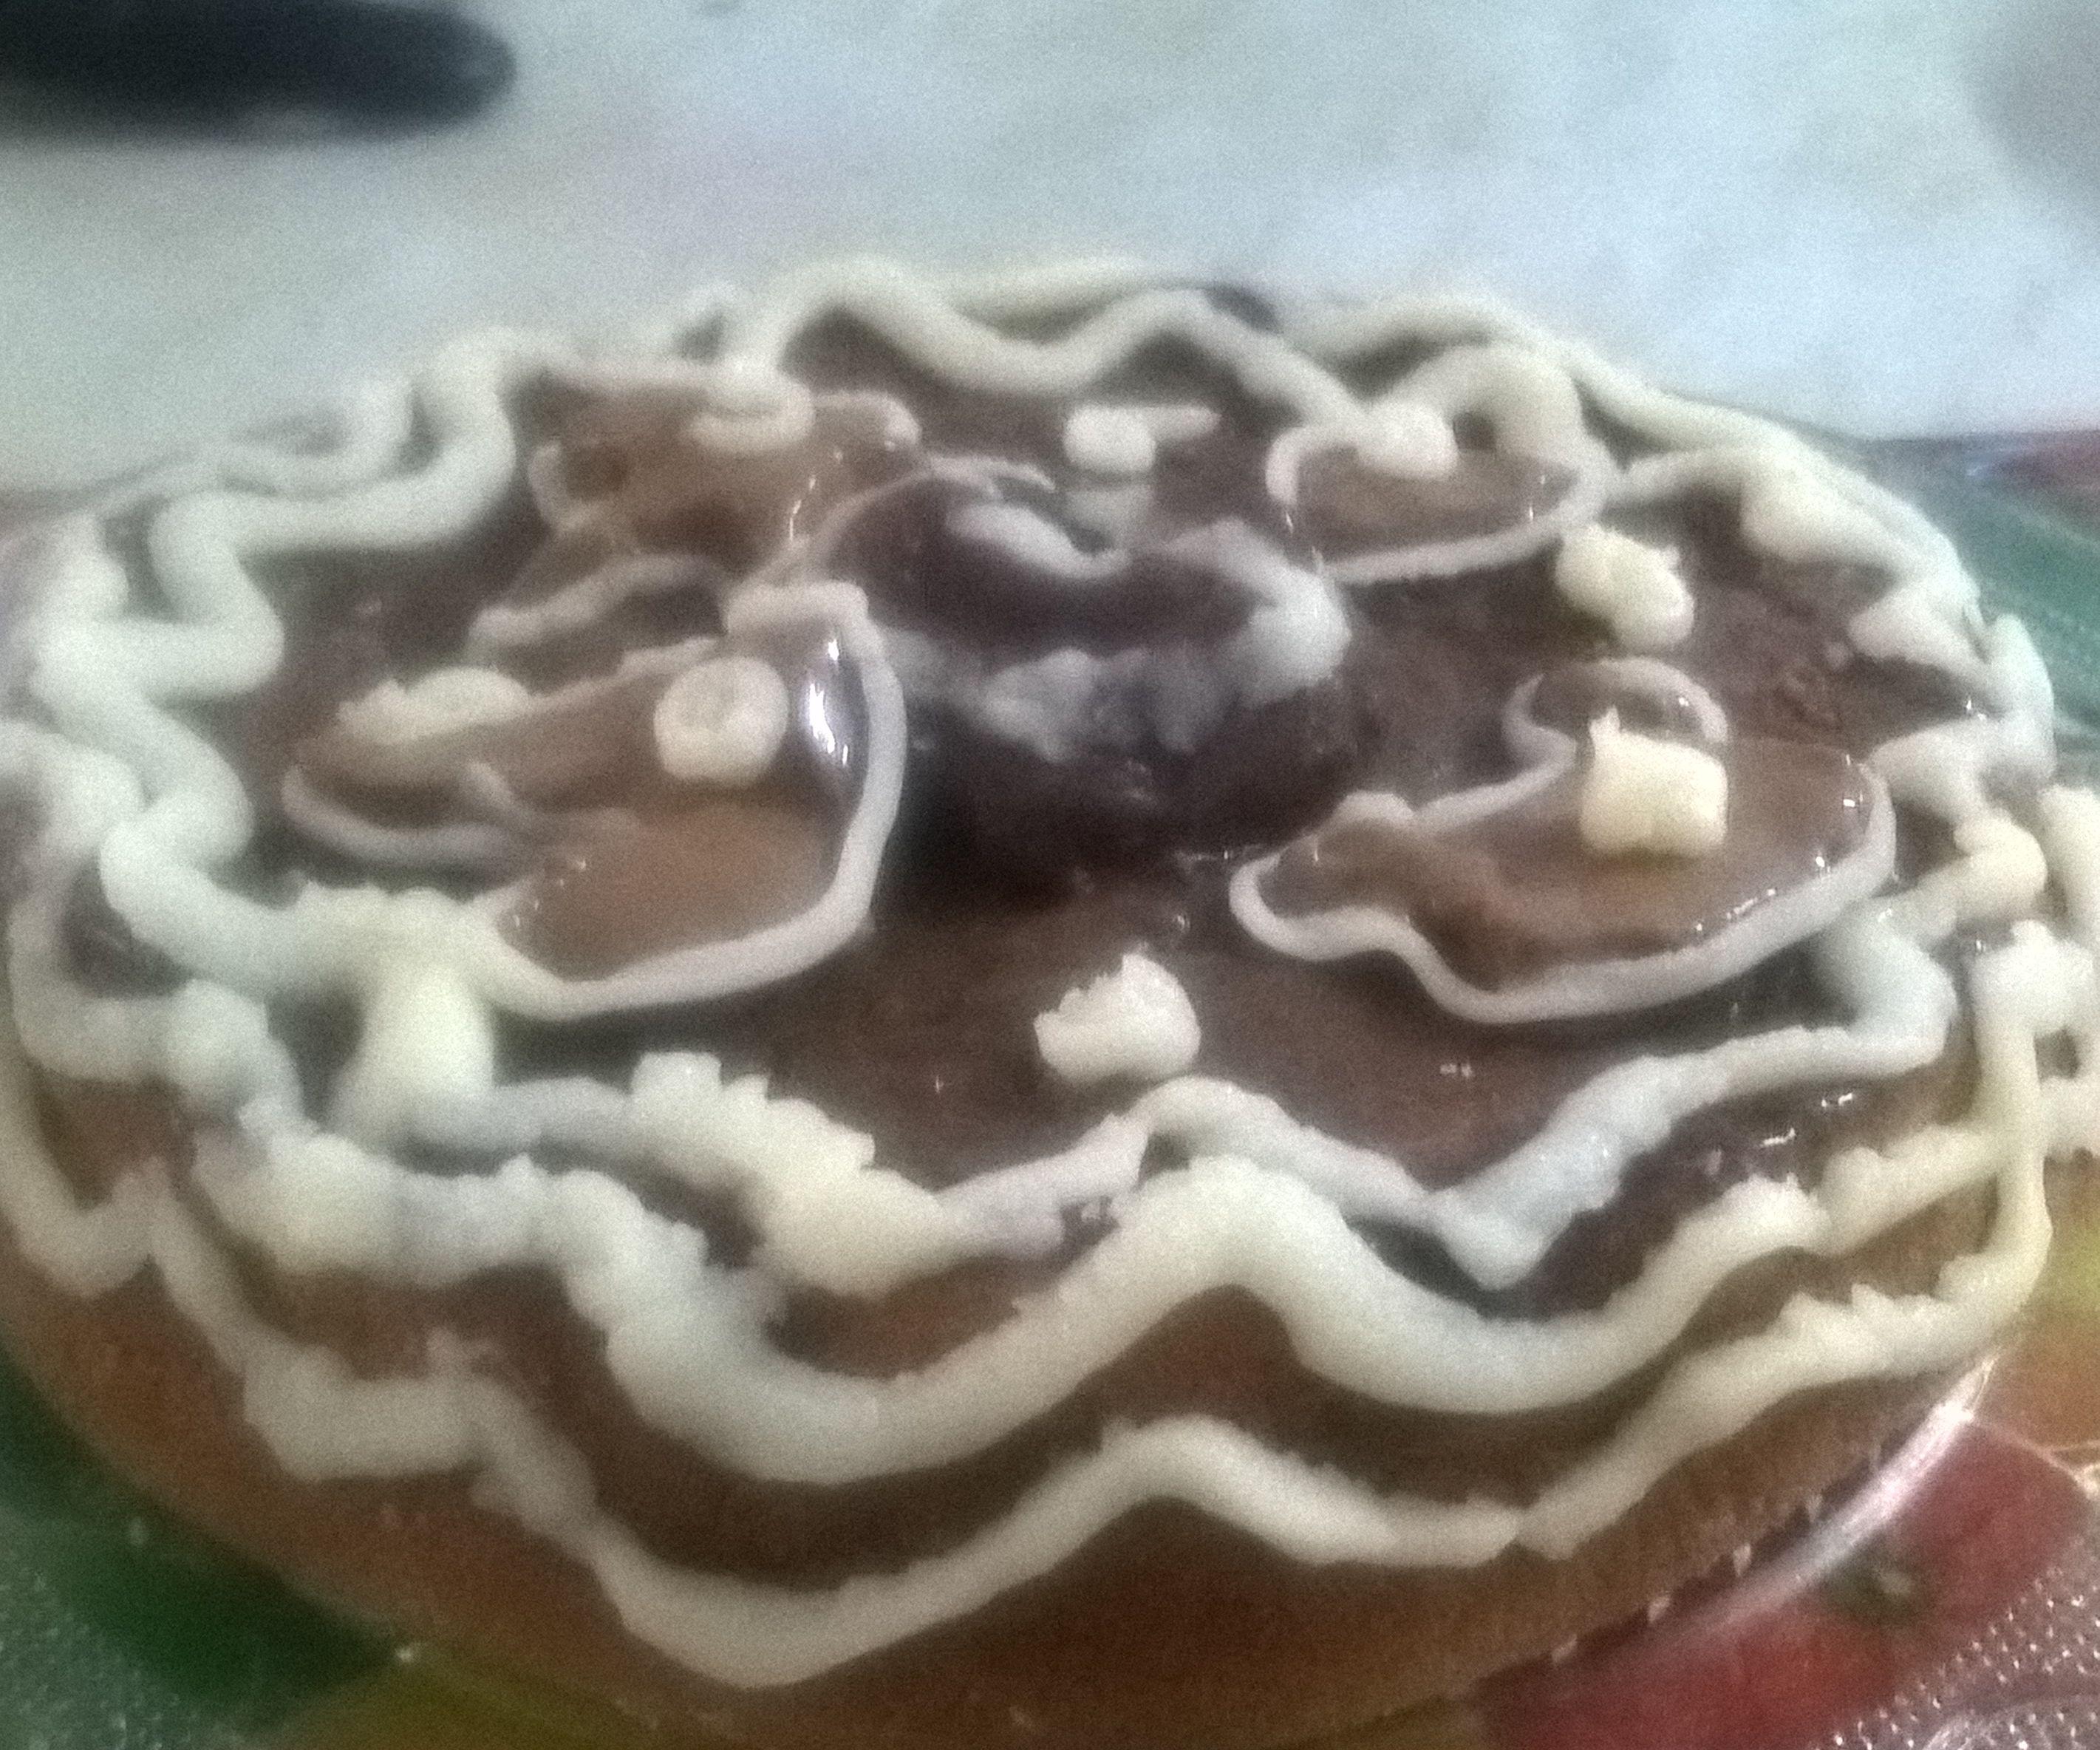 Yummy Cake :-P